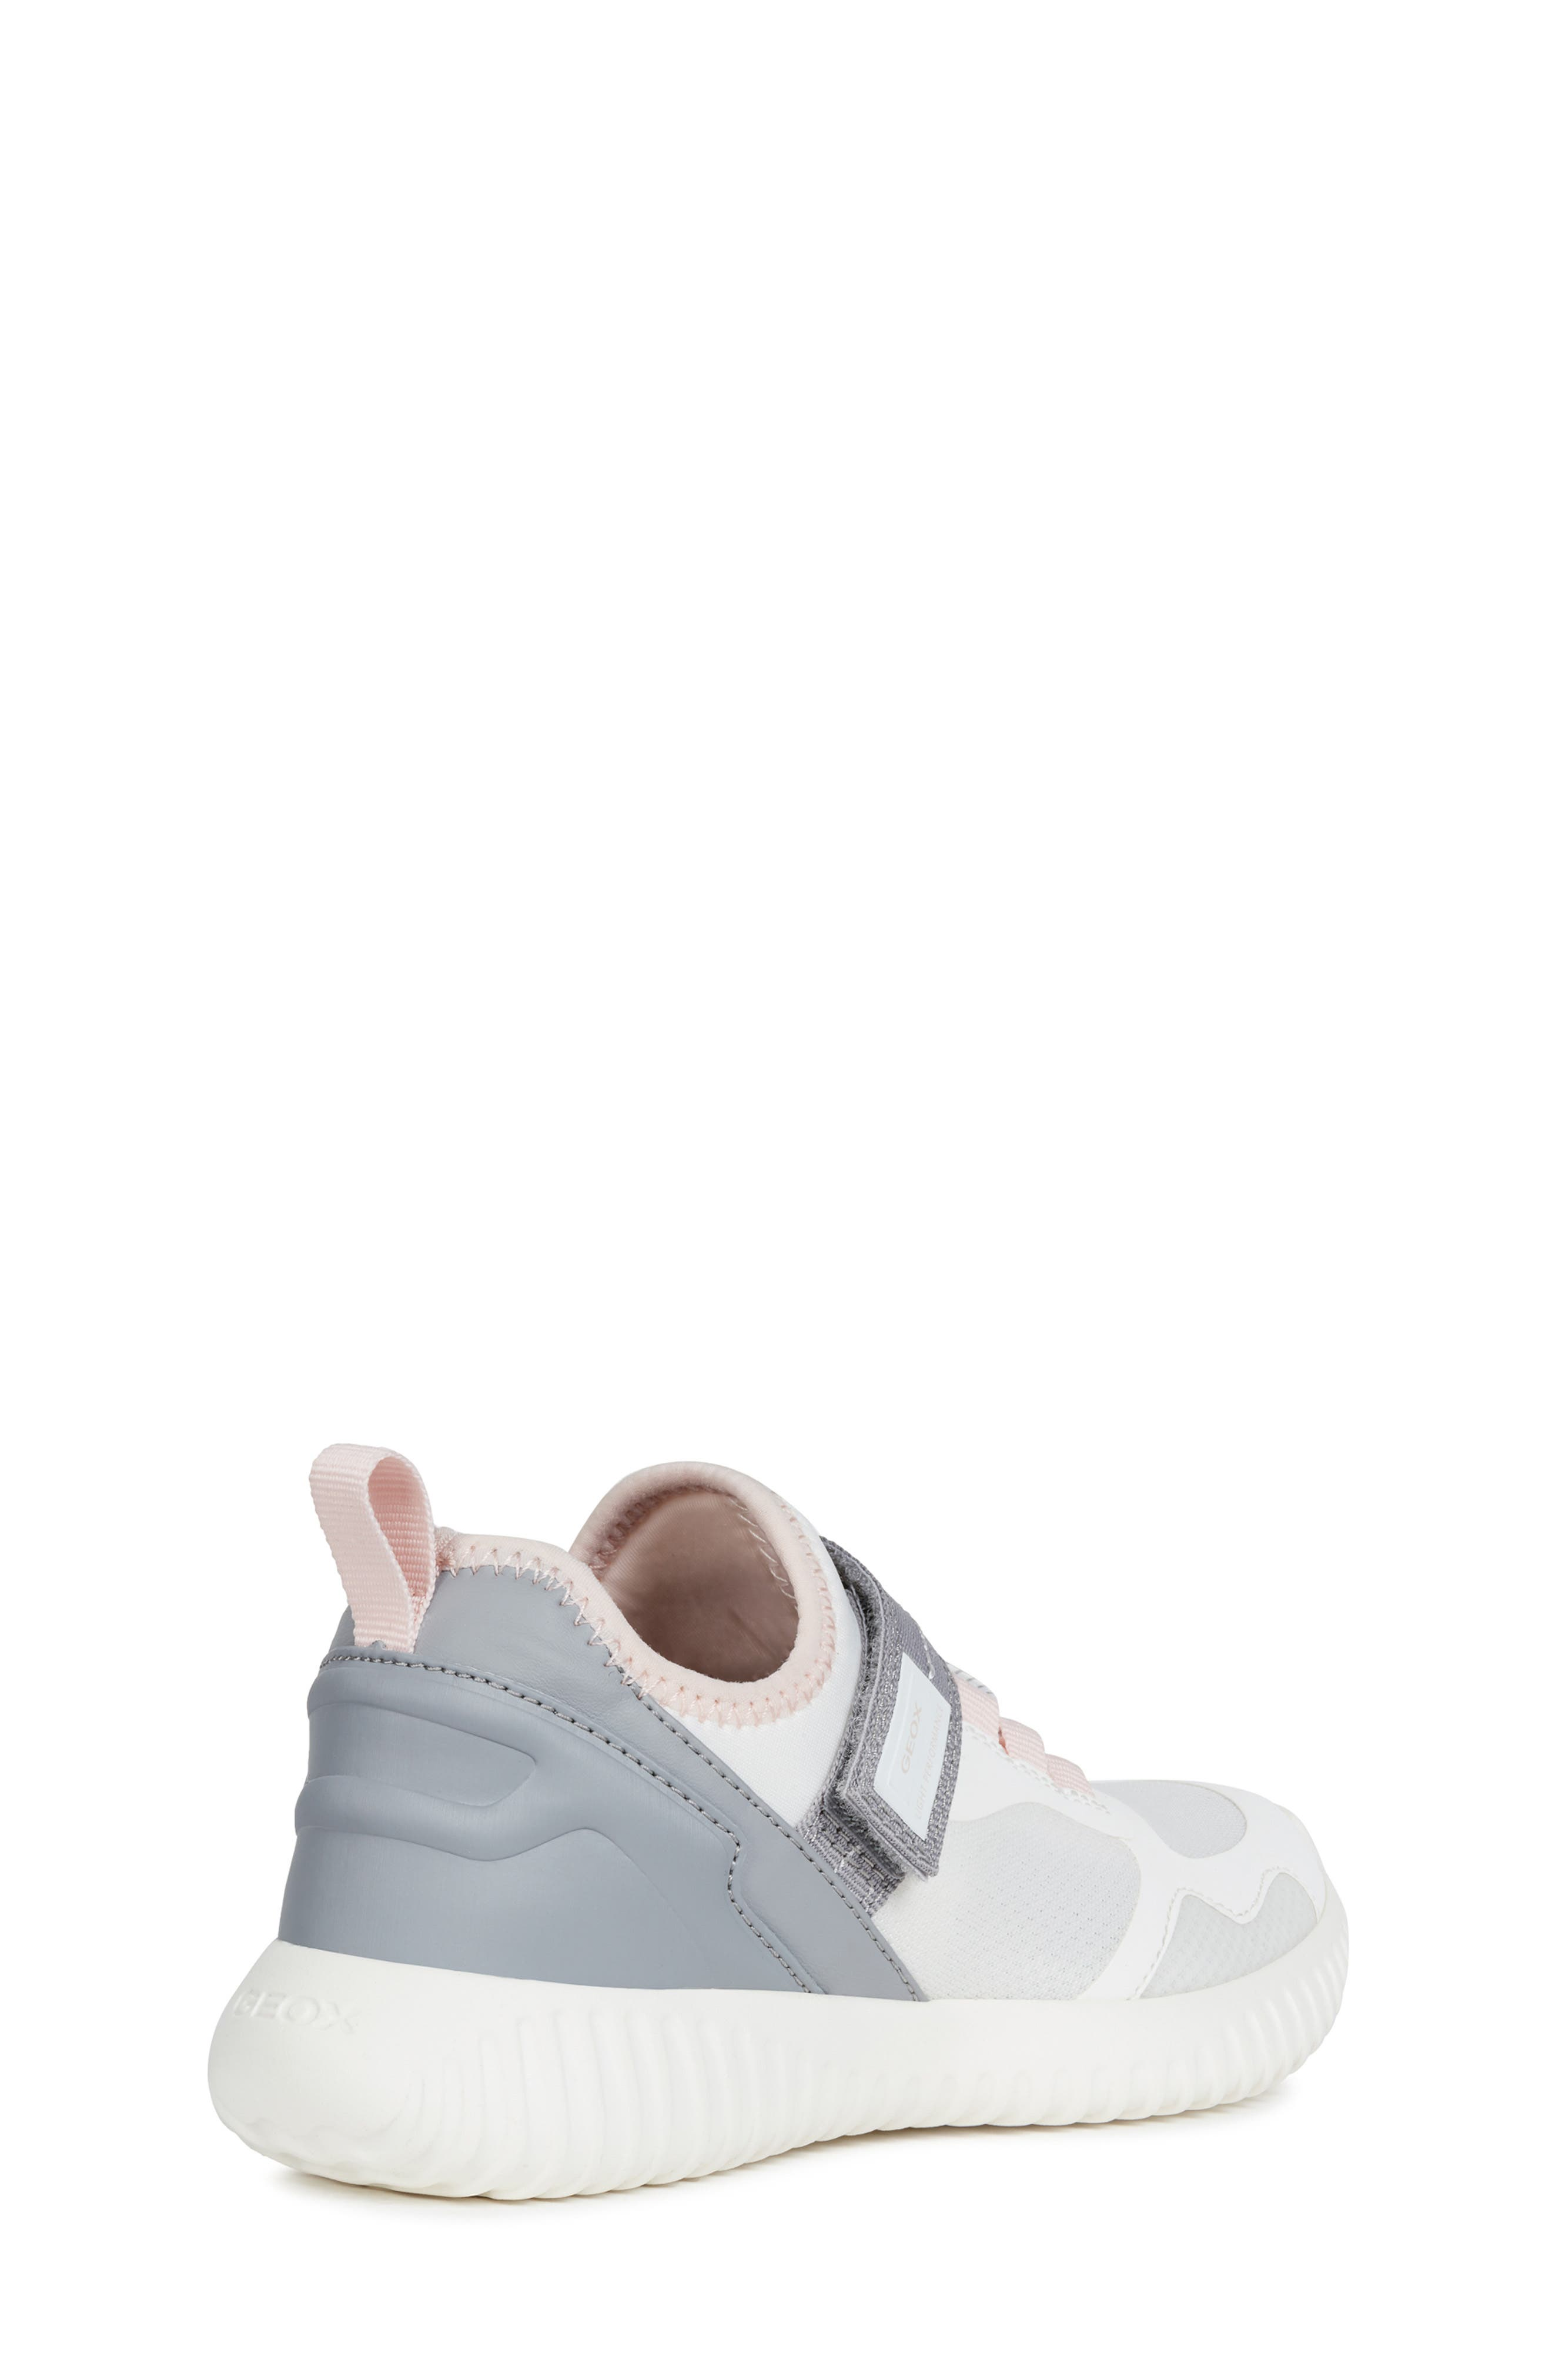 GEOX, Waviness Sneaker, Alternate thumbnail 7, color, WHITE/ GREY